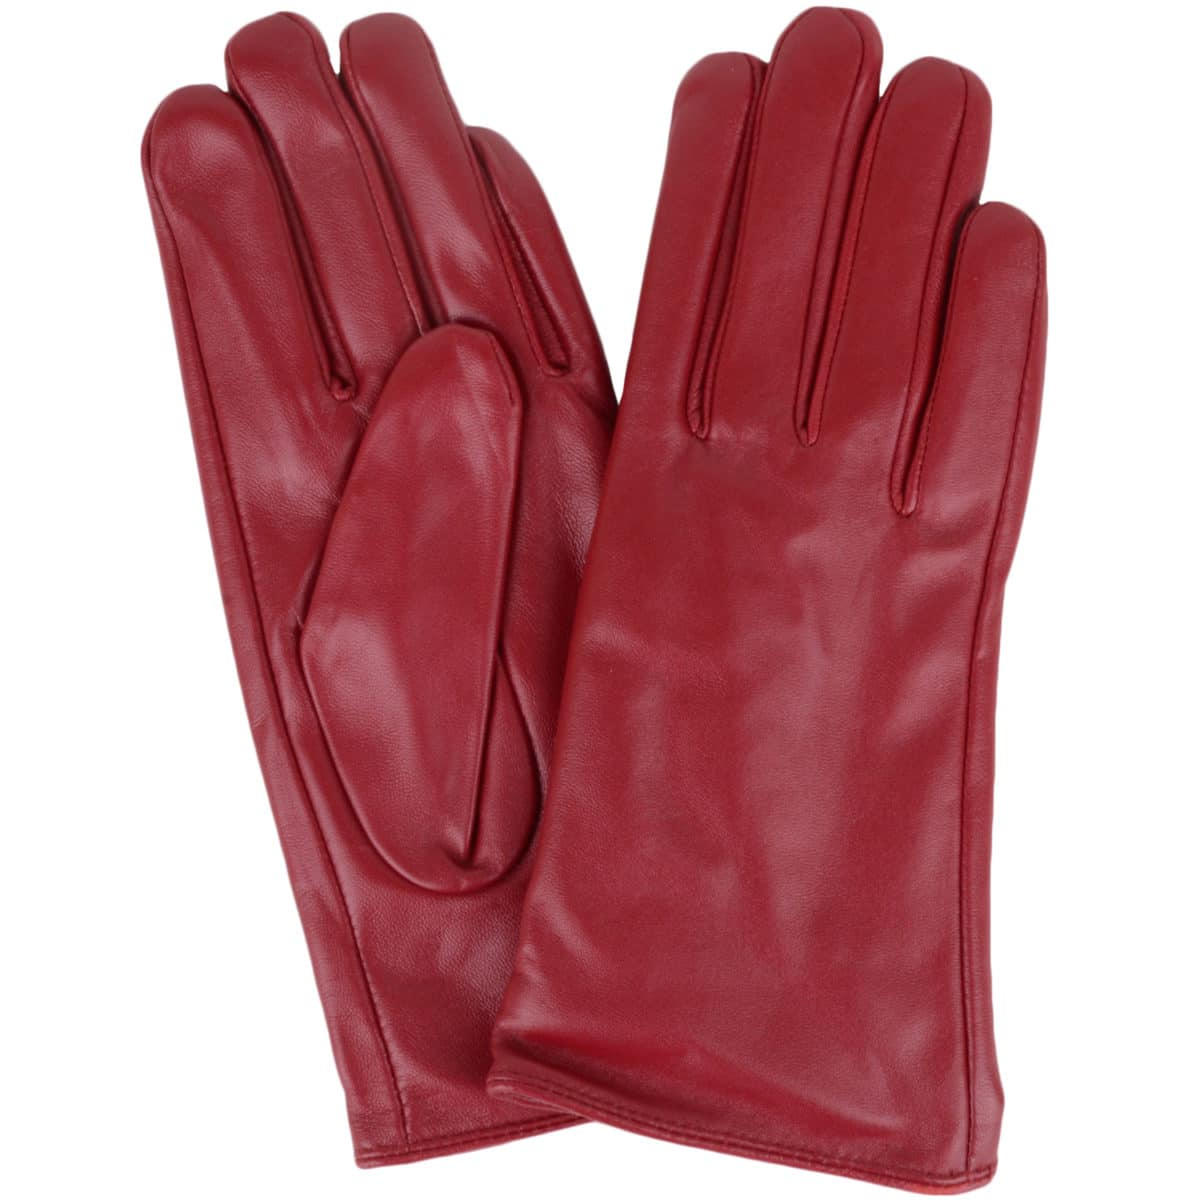 Tamara - Leather Gloves - Red